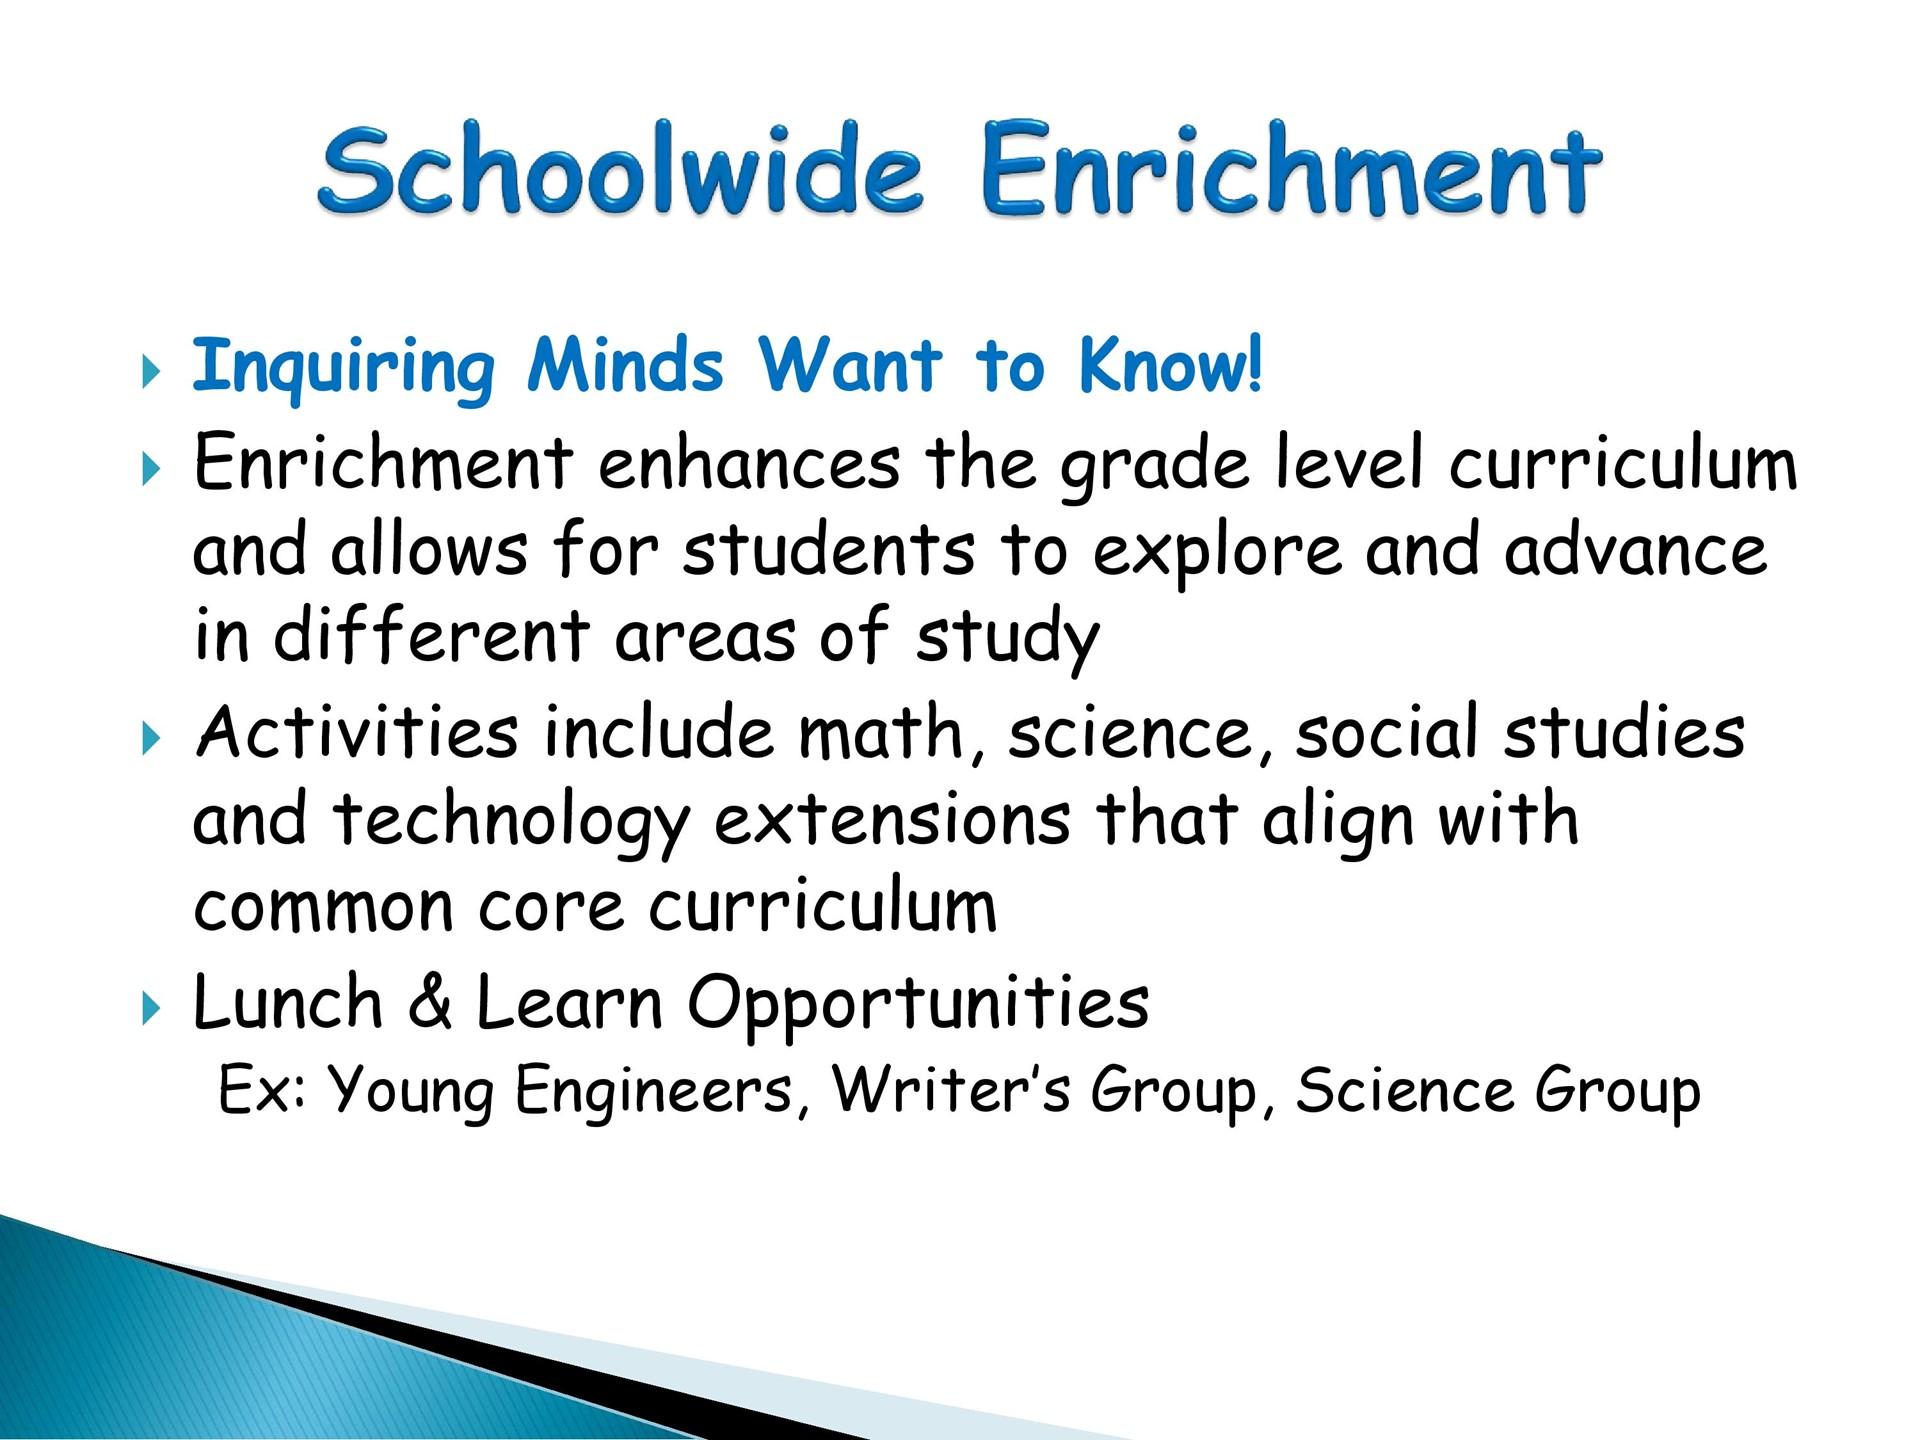 Schoolwide Enrichment